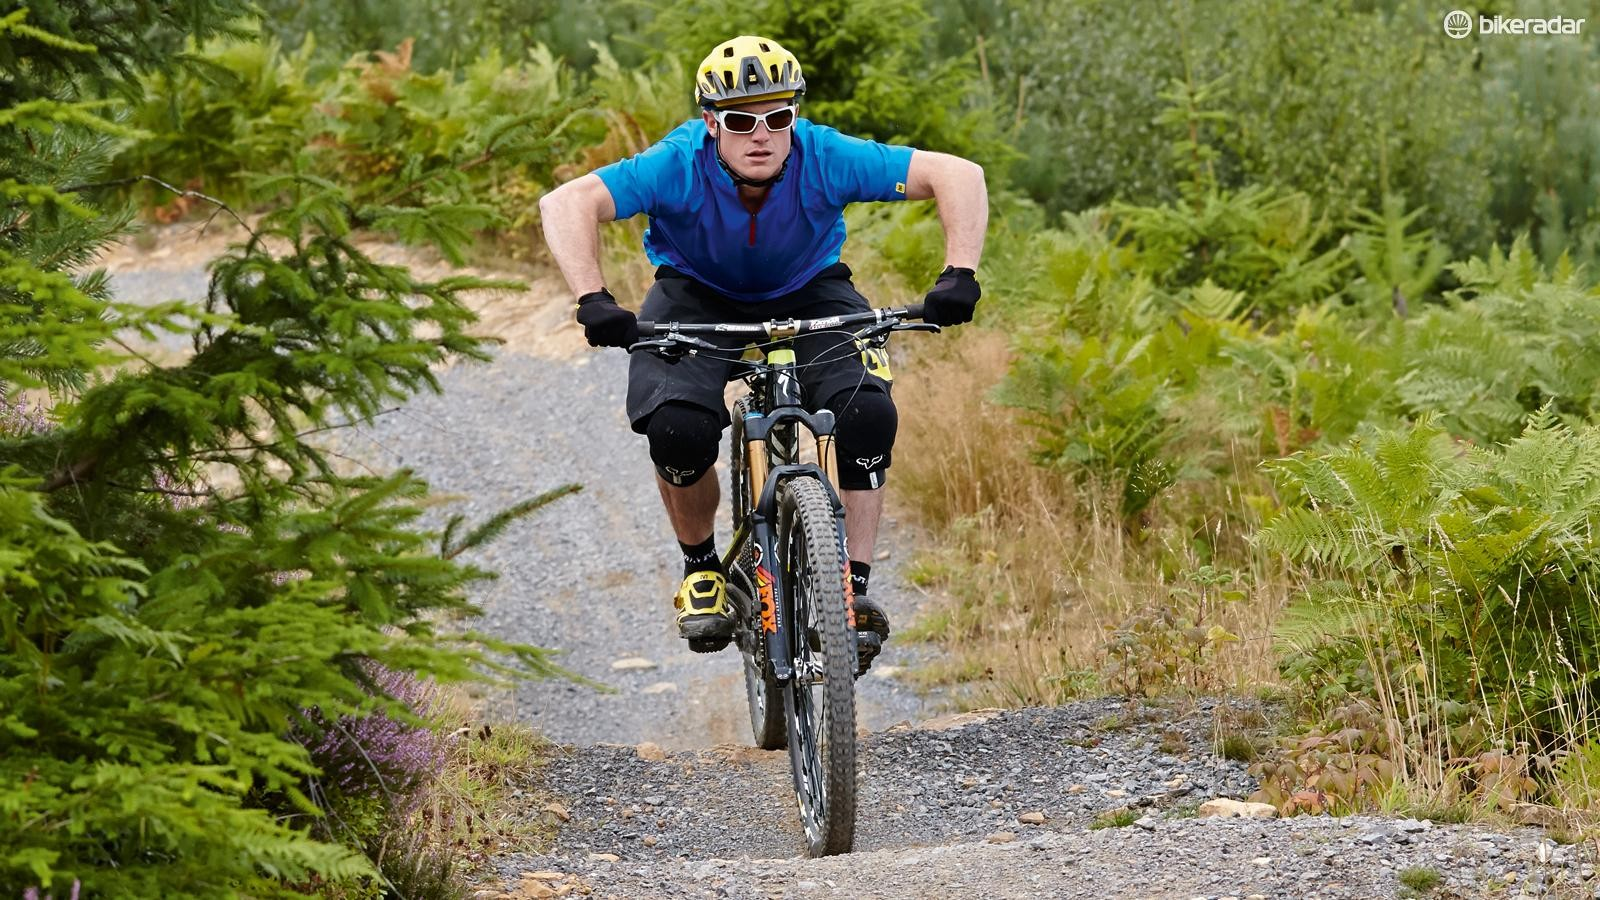 3. Push down through your legs to generate momentum